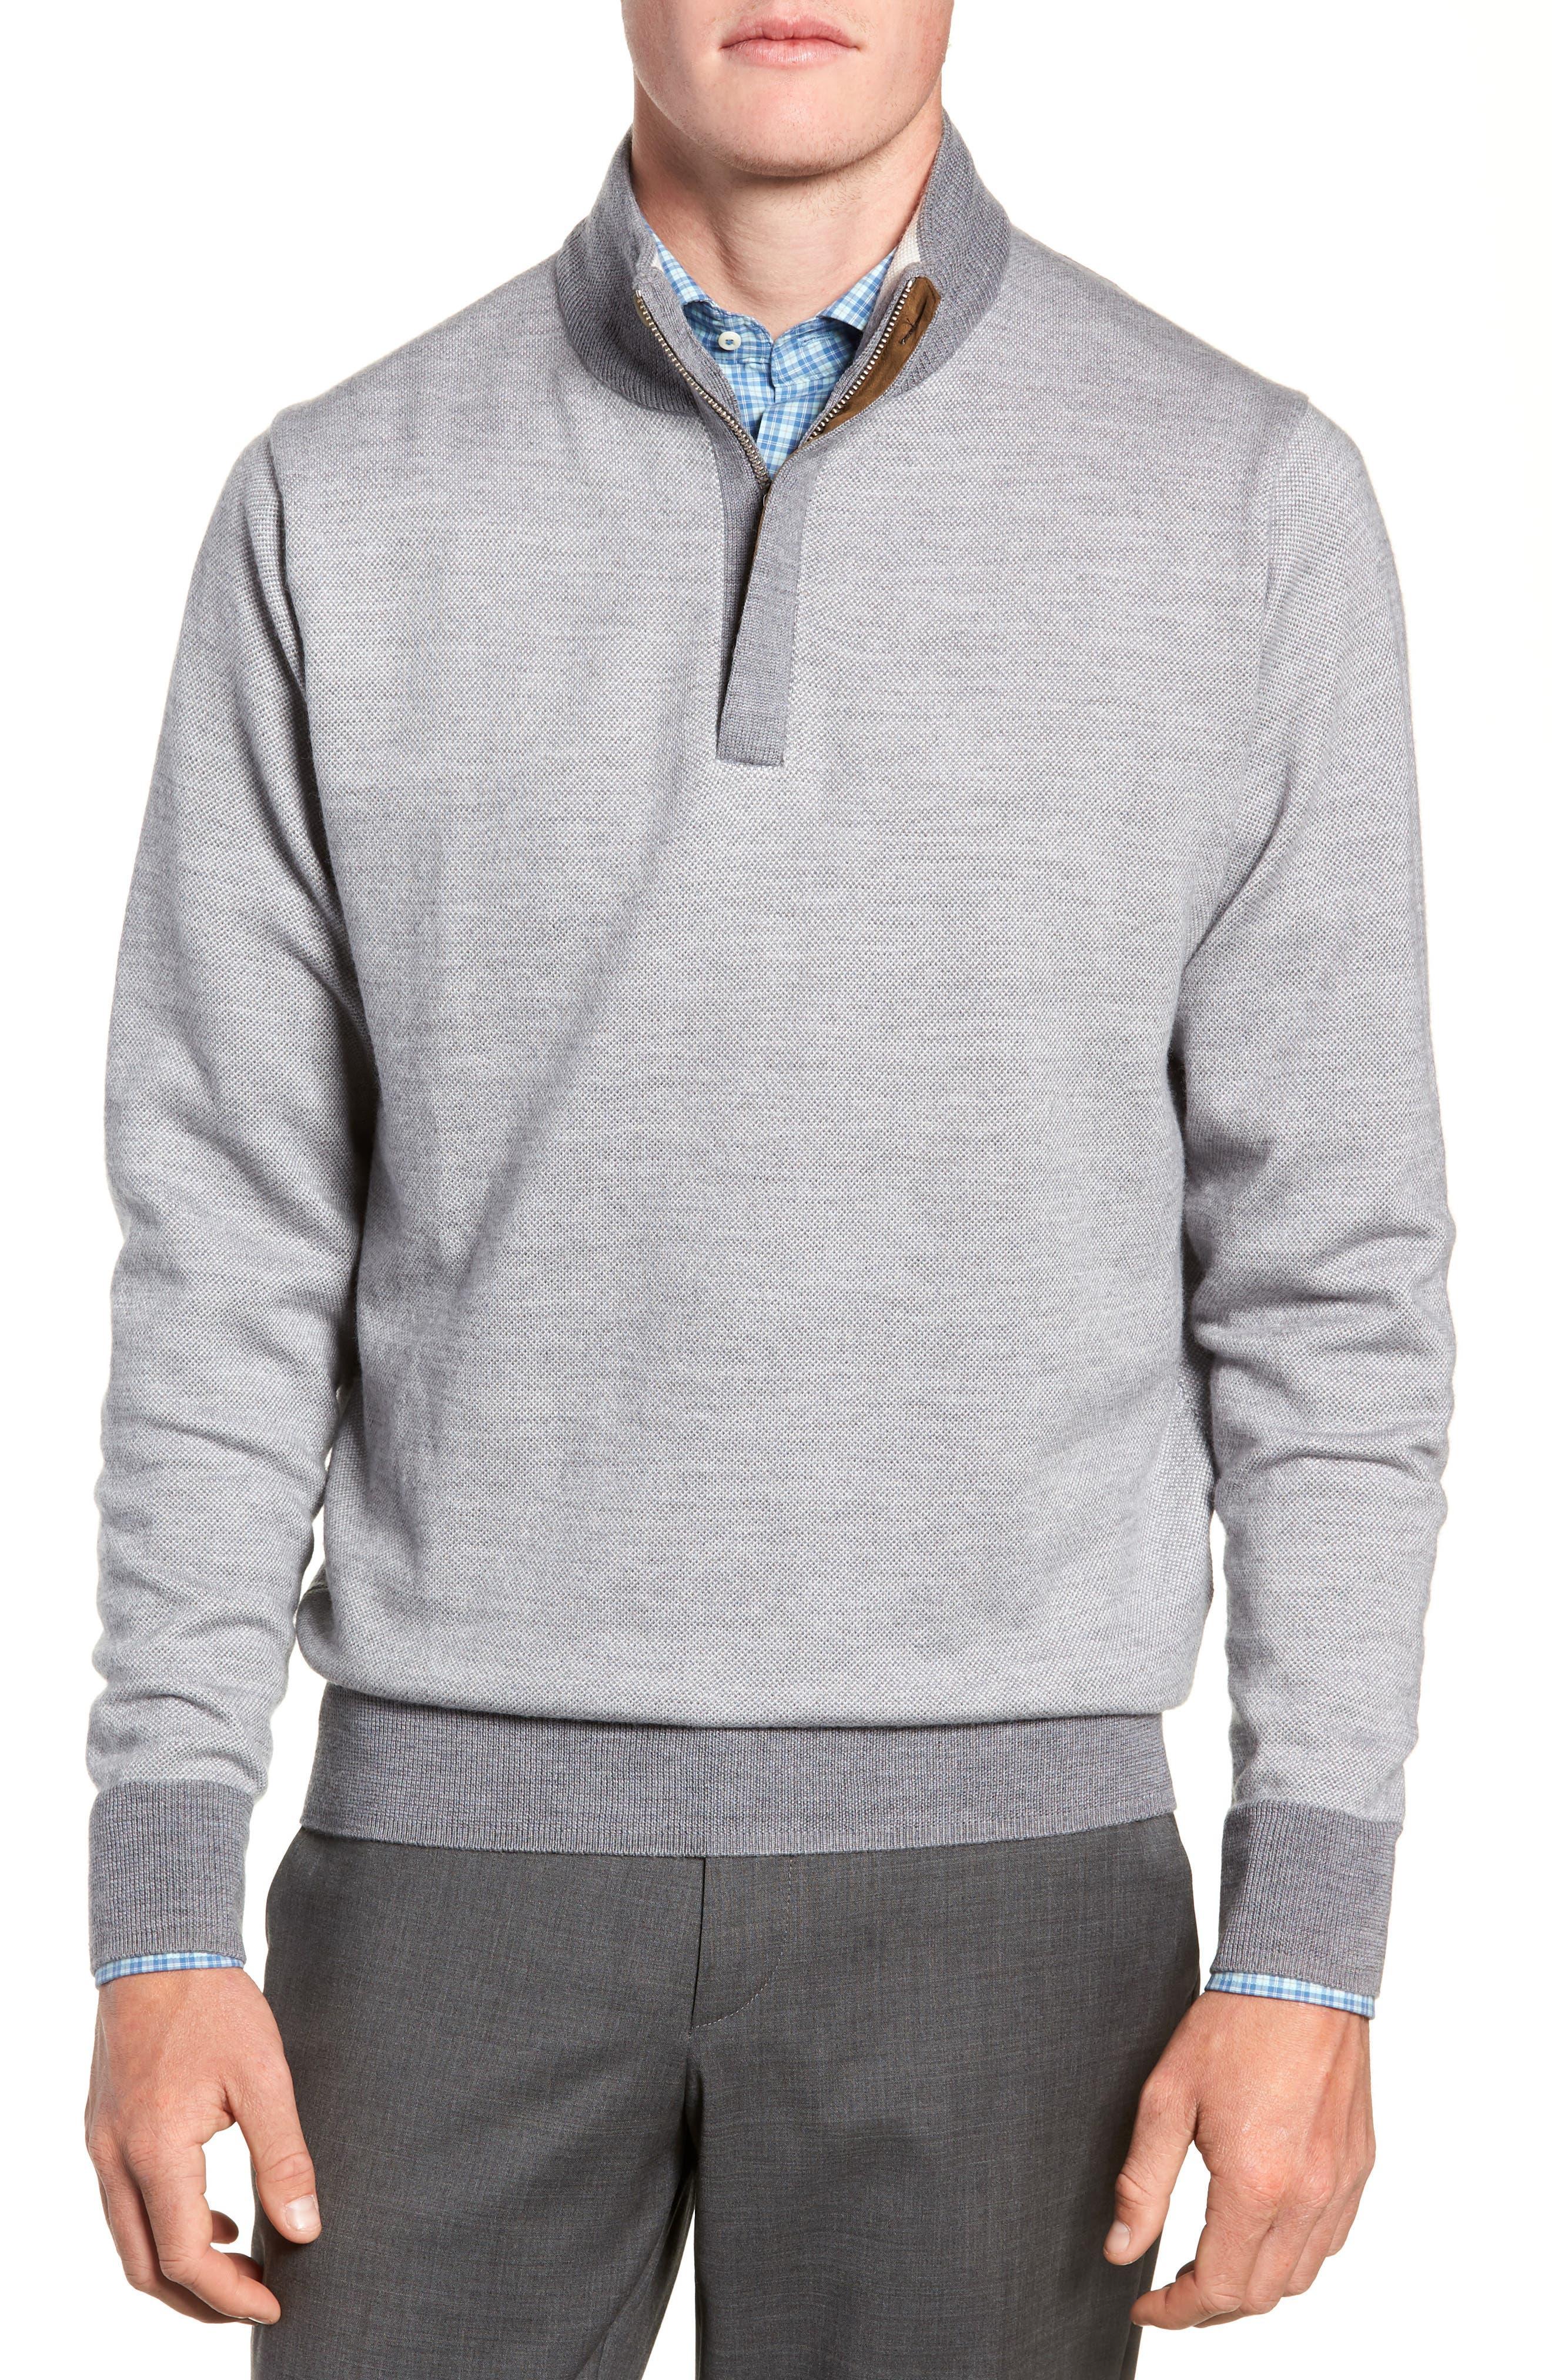 Birdseye Merino Wool Quarter Zip Sweater,                             Main thumbnail 1, color,                             BRITISH GREY